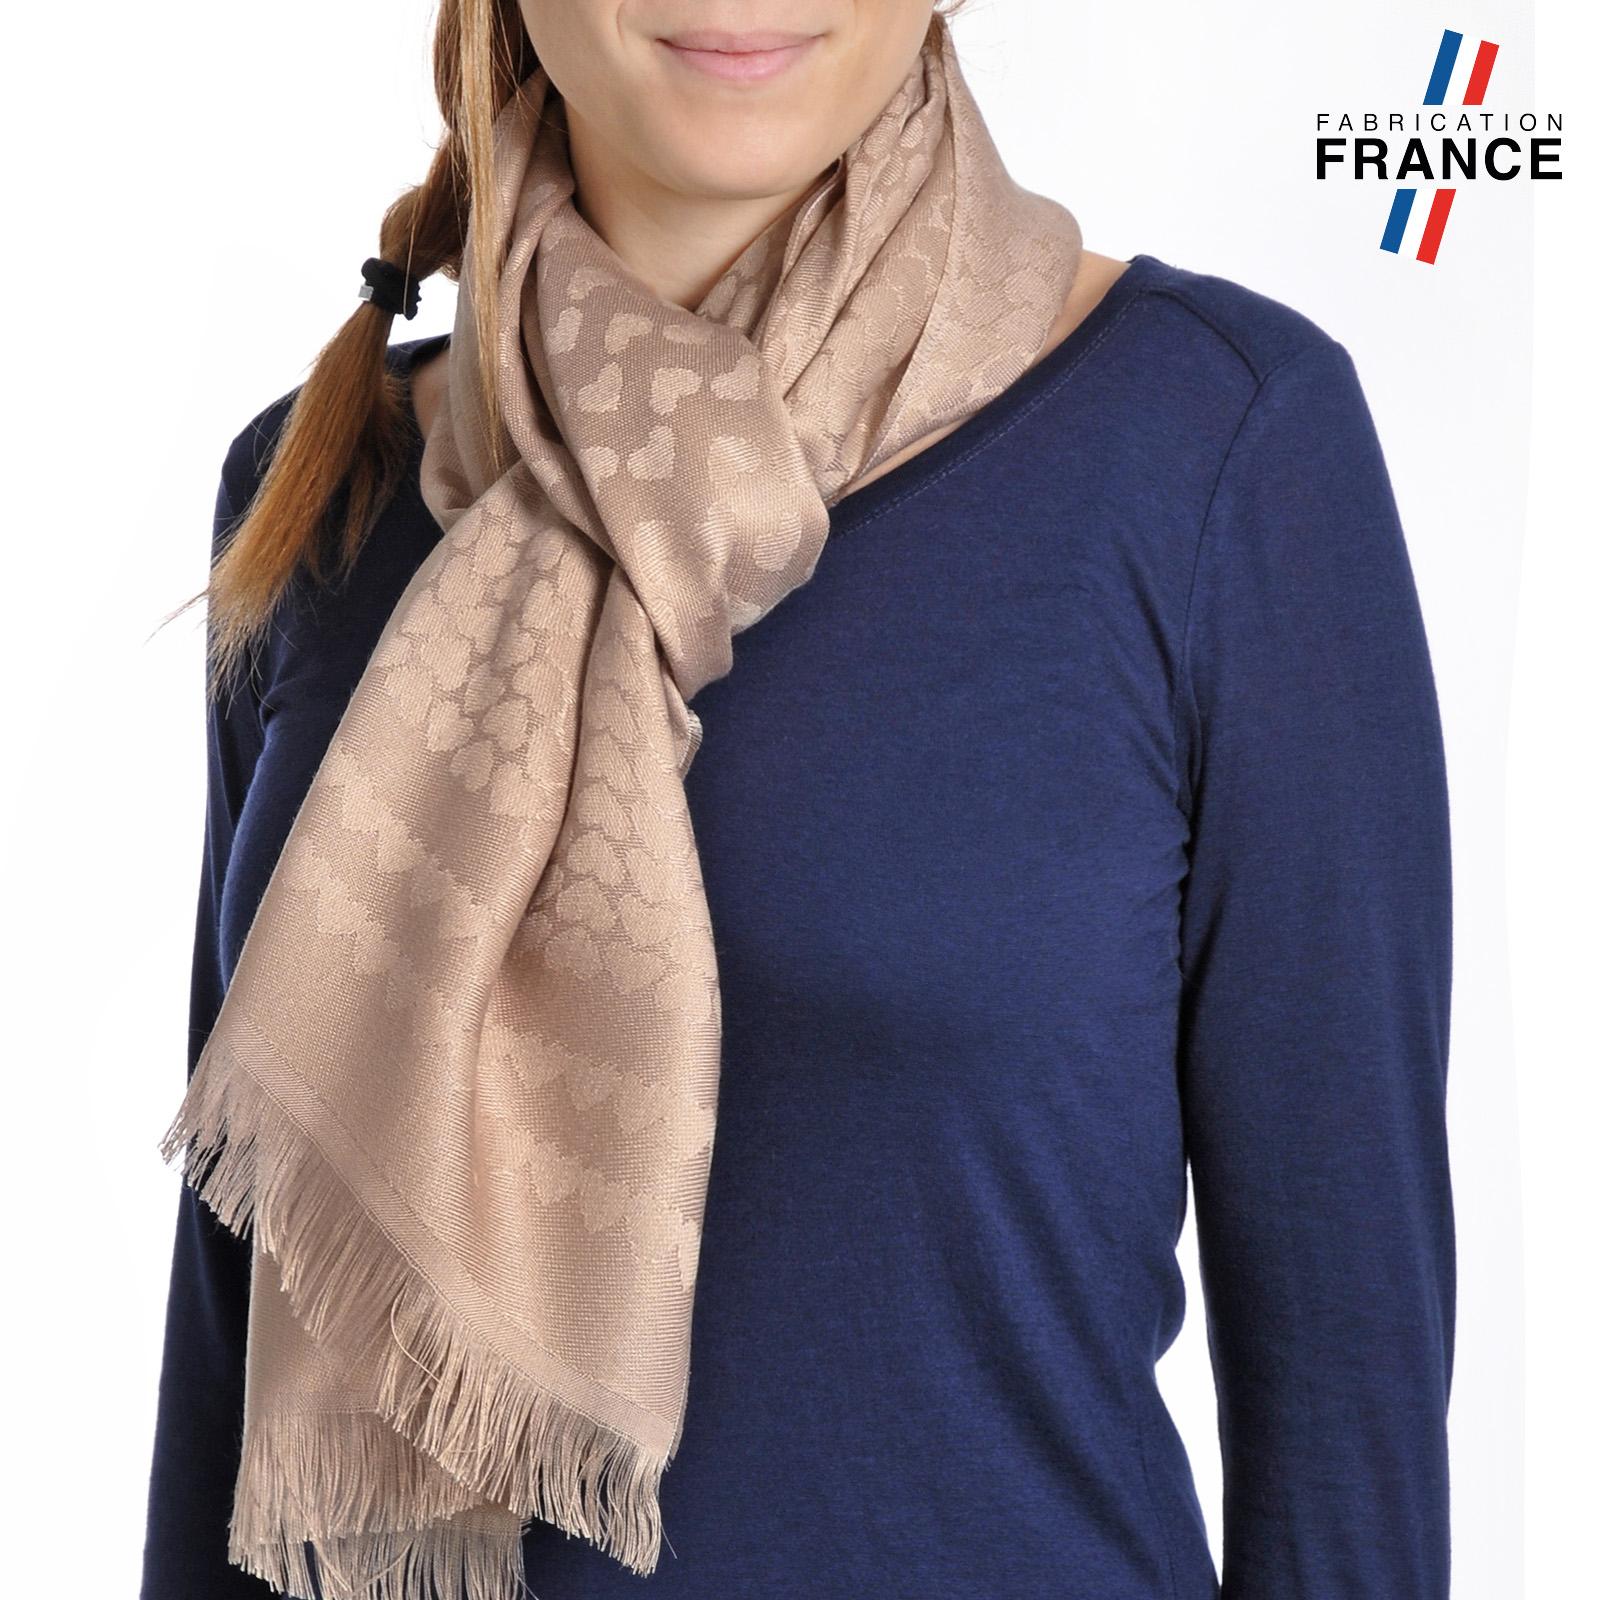 AT-04268-VF16-T-LB_FR-echarpe-legere-beige-qualicoq-motifs-coeurs-beige